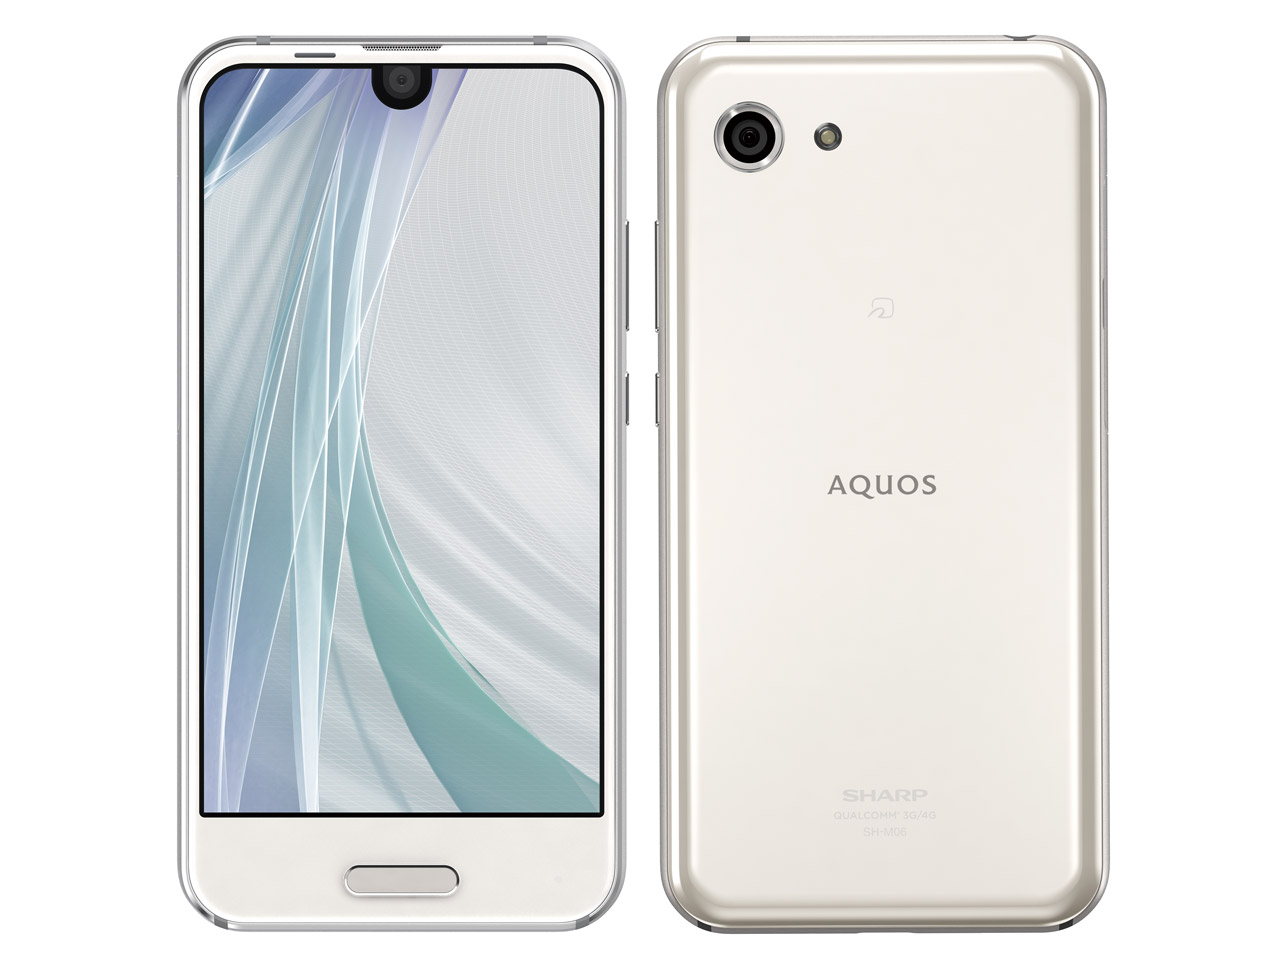 SHARP(シャープ) AQUOS R compact SH-M06 SIMフリー [ホワイト]